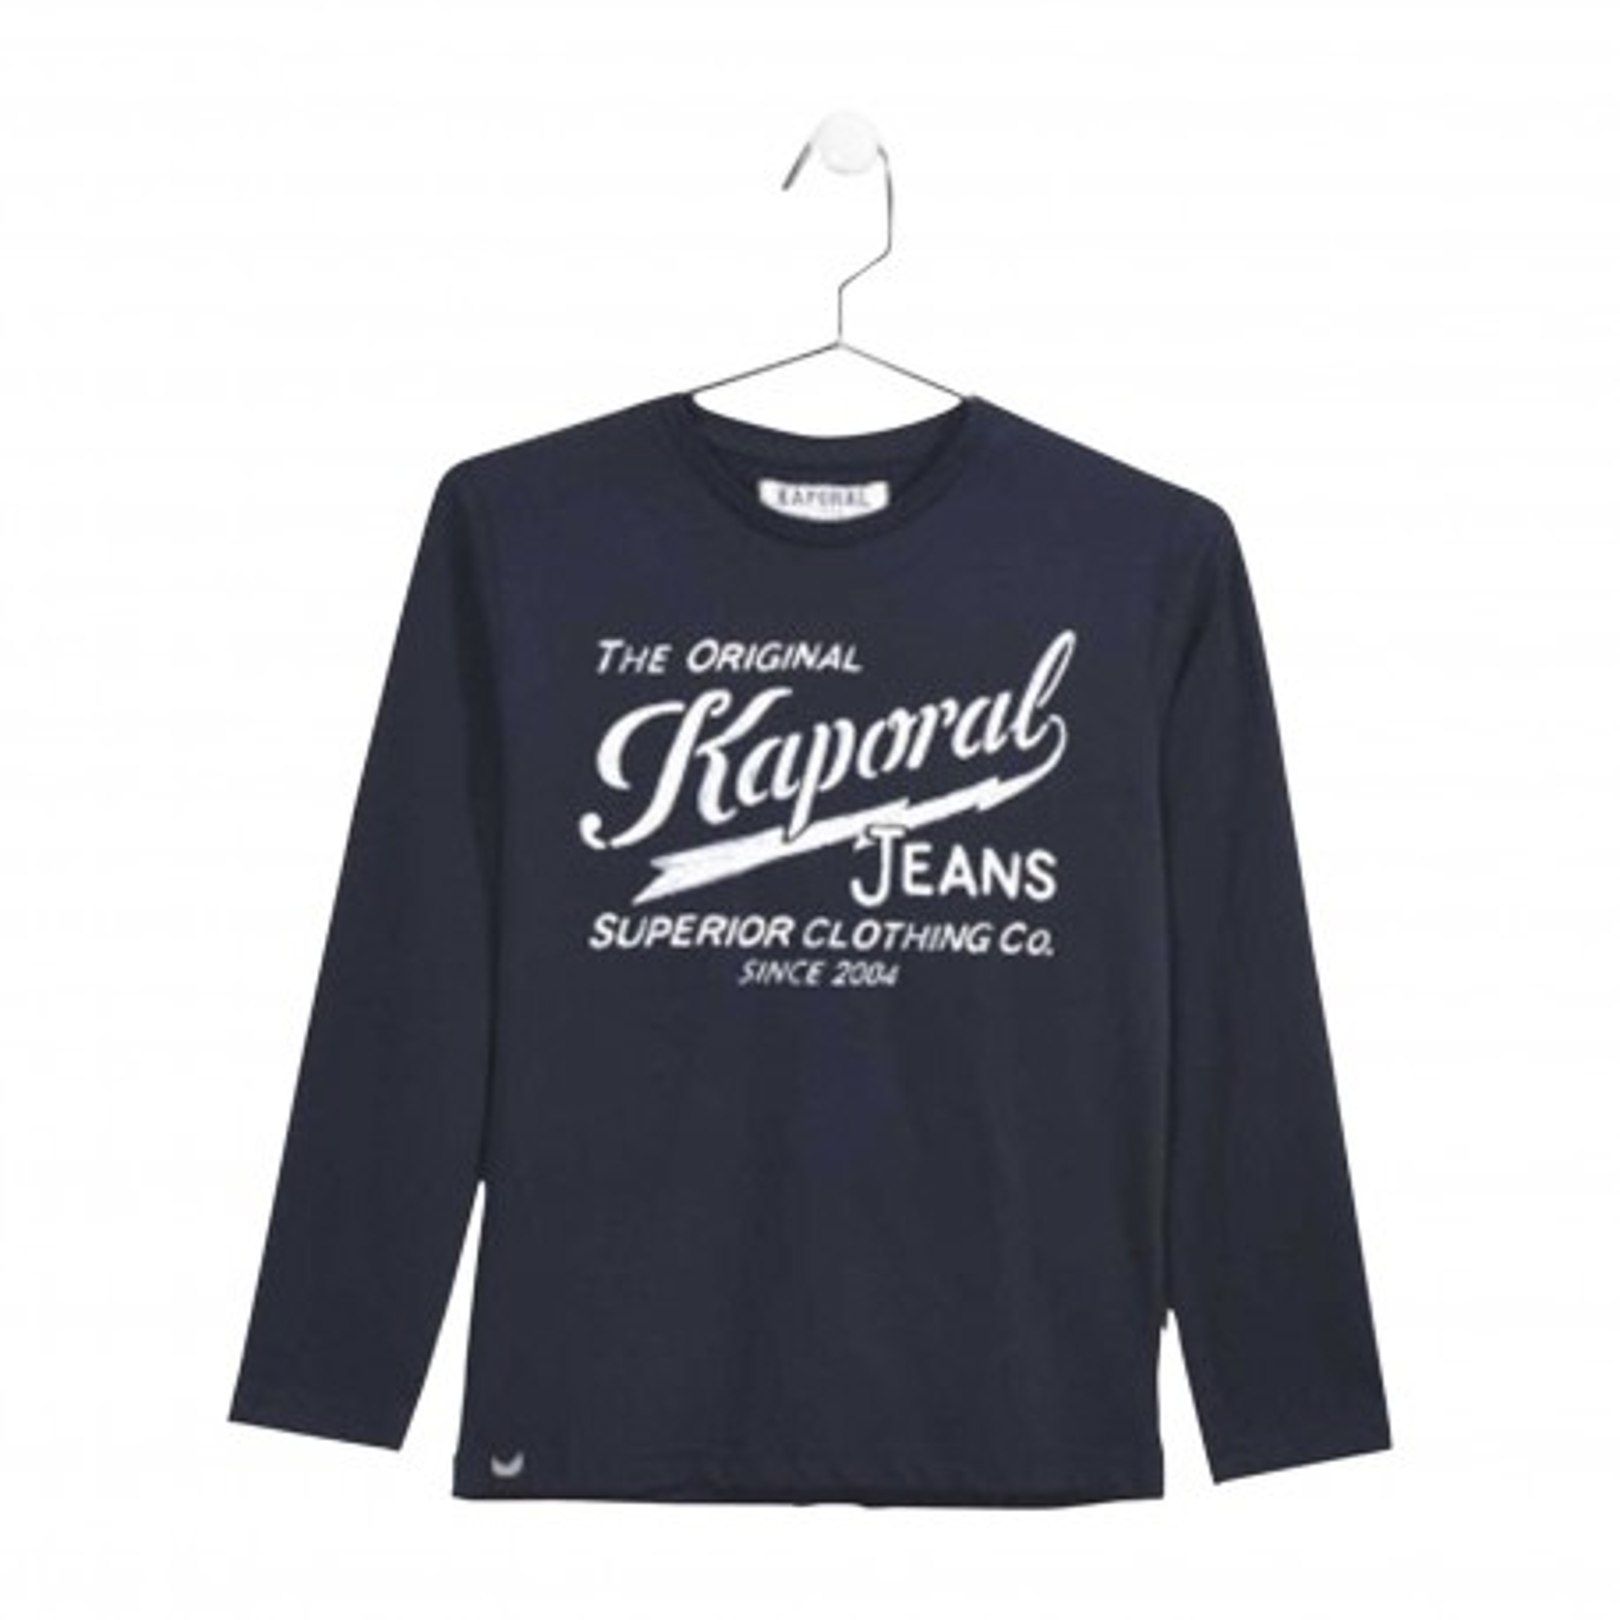 cdd05b5c0db78 Tee Shirt à manches longues Enfant Kaporal Muse - Galerie-Chic